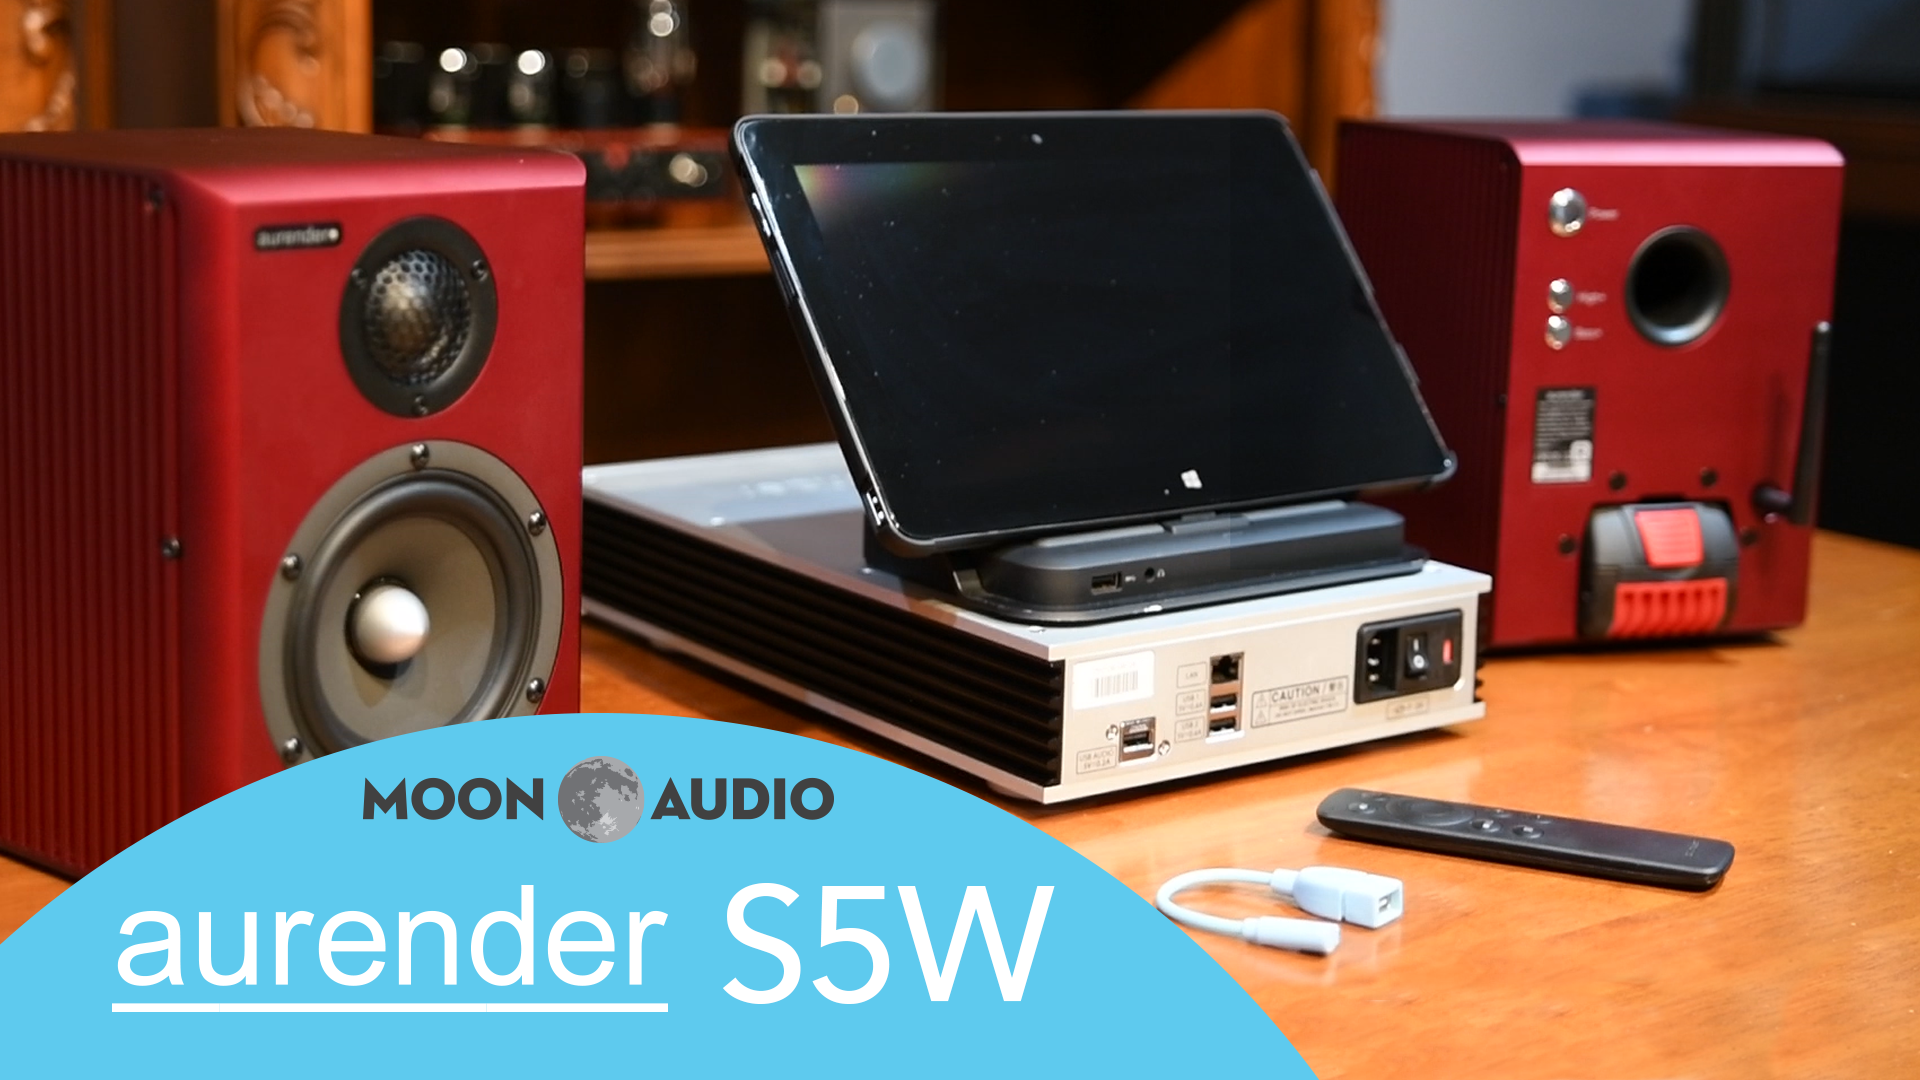 Aurender S5W Video